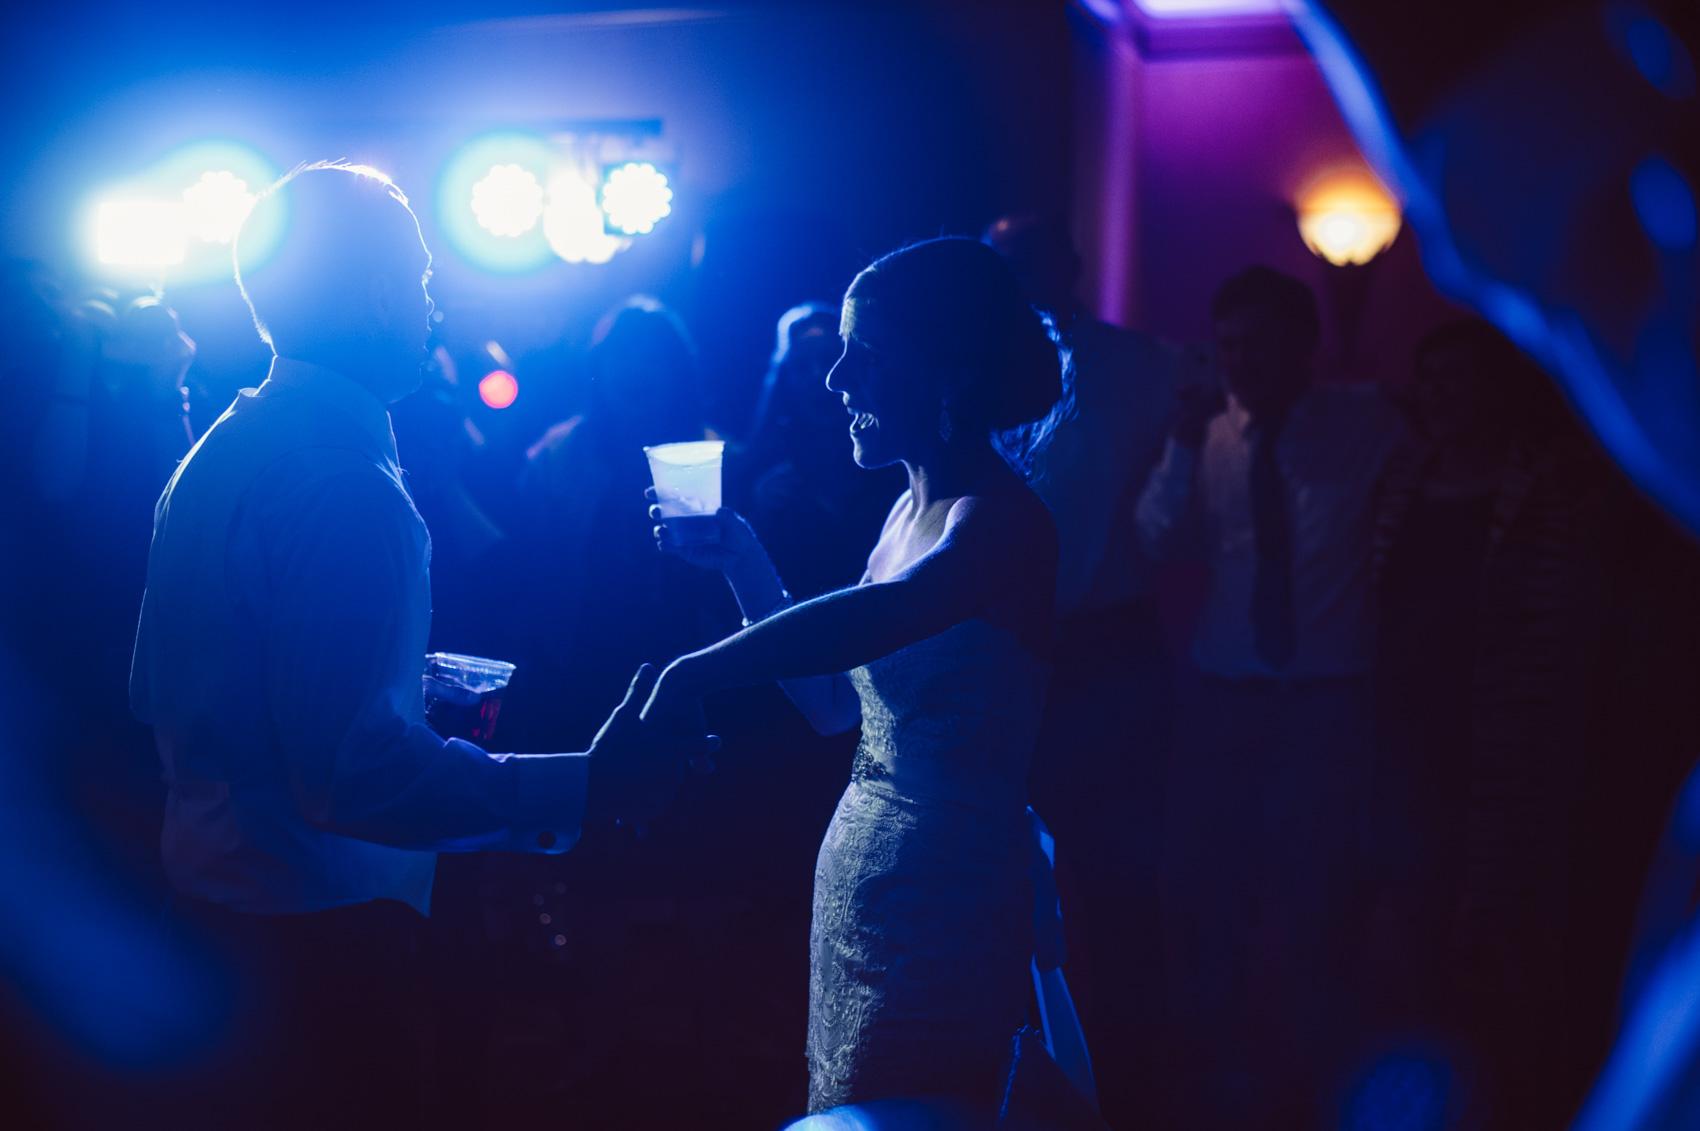 050-oberports-wedding-reception-portfolio